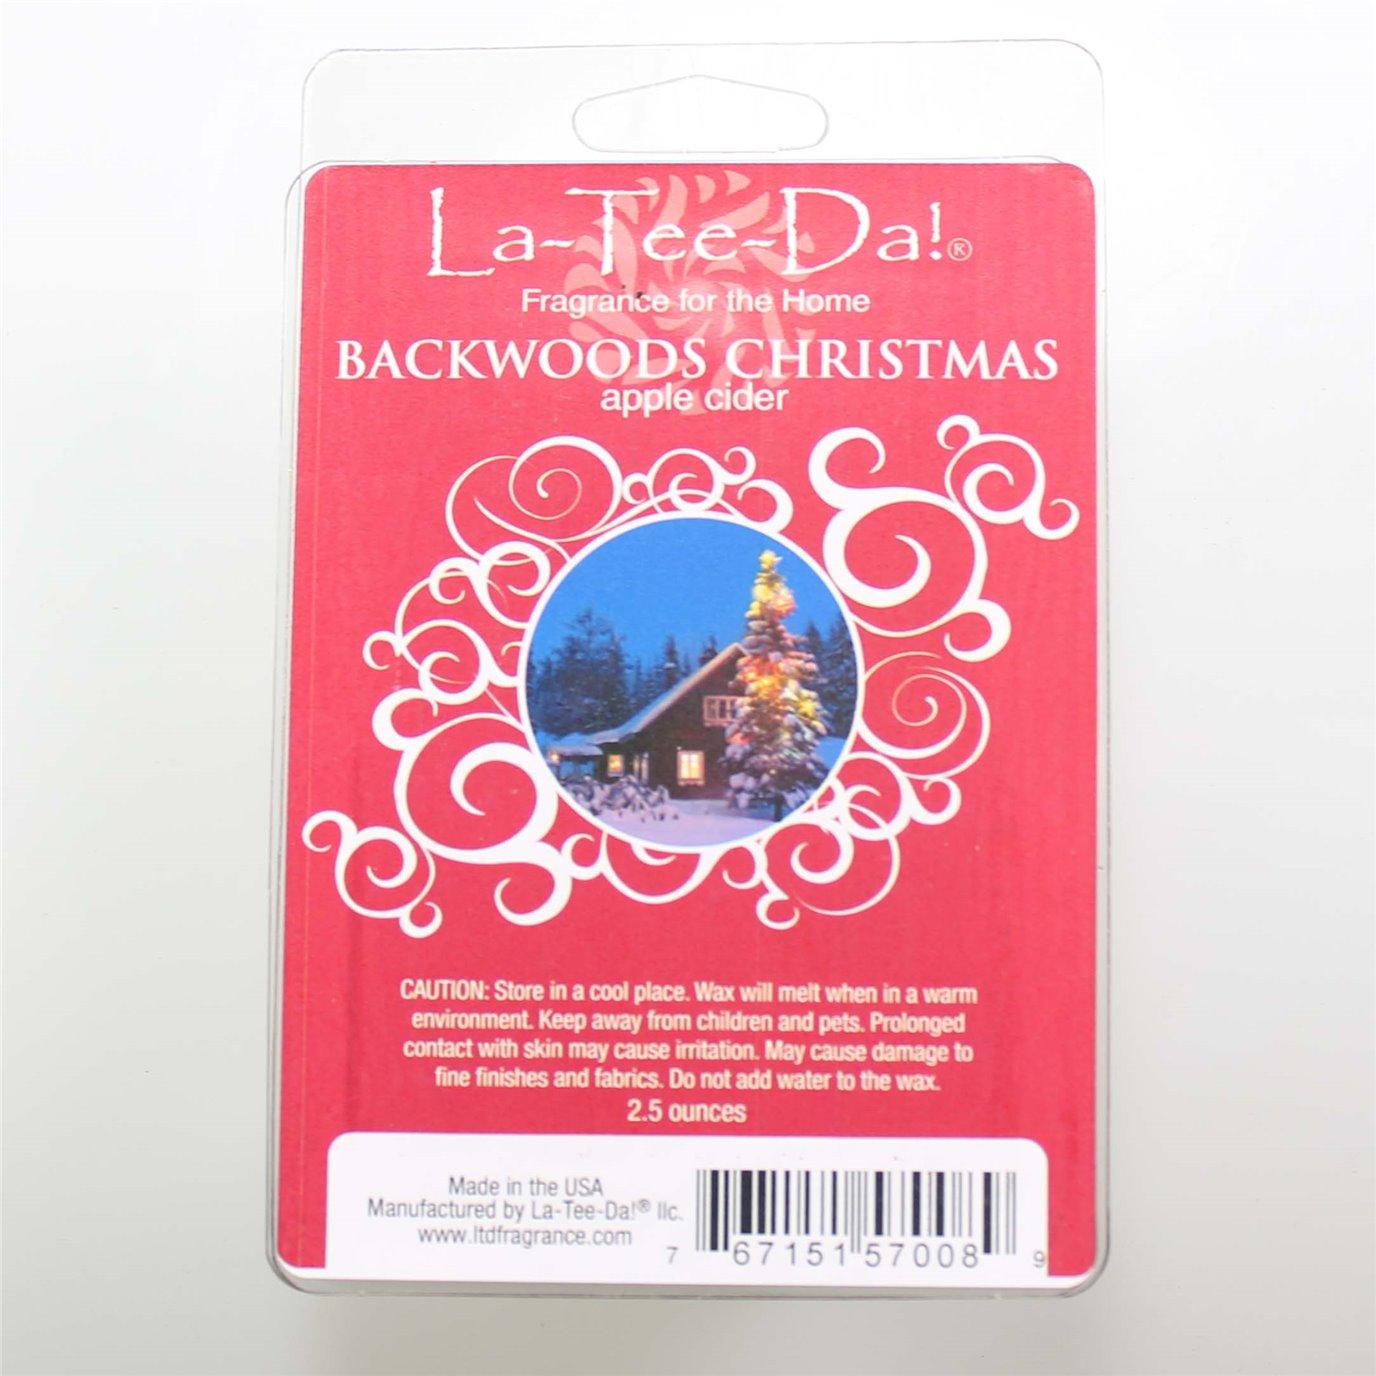 La-Tee-Da Wax Melts Backwoods Christmas - Apple Cider